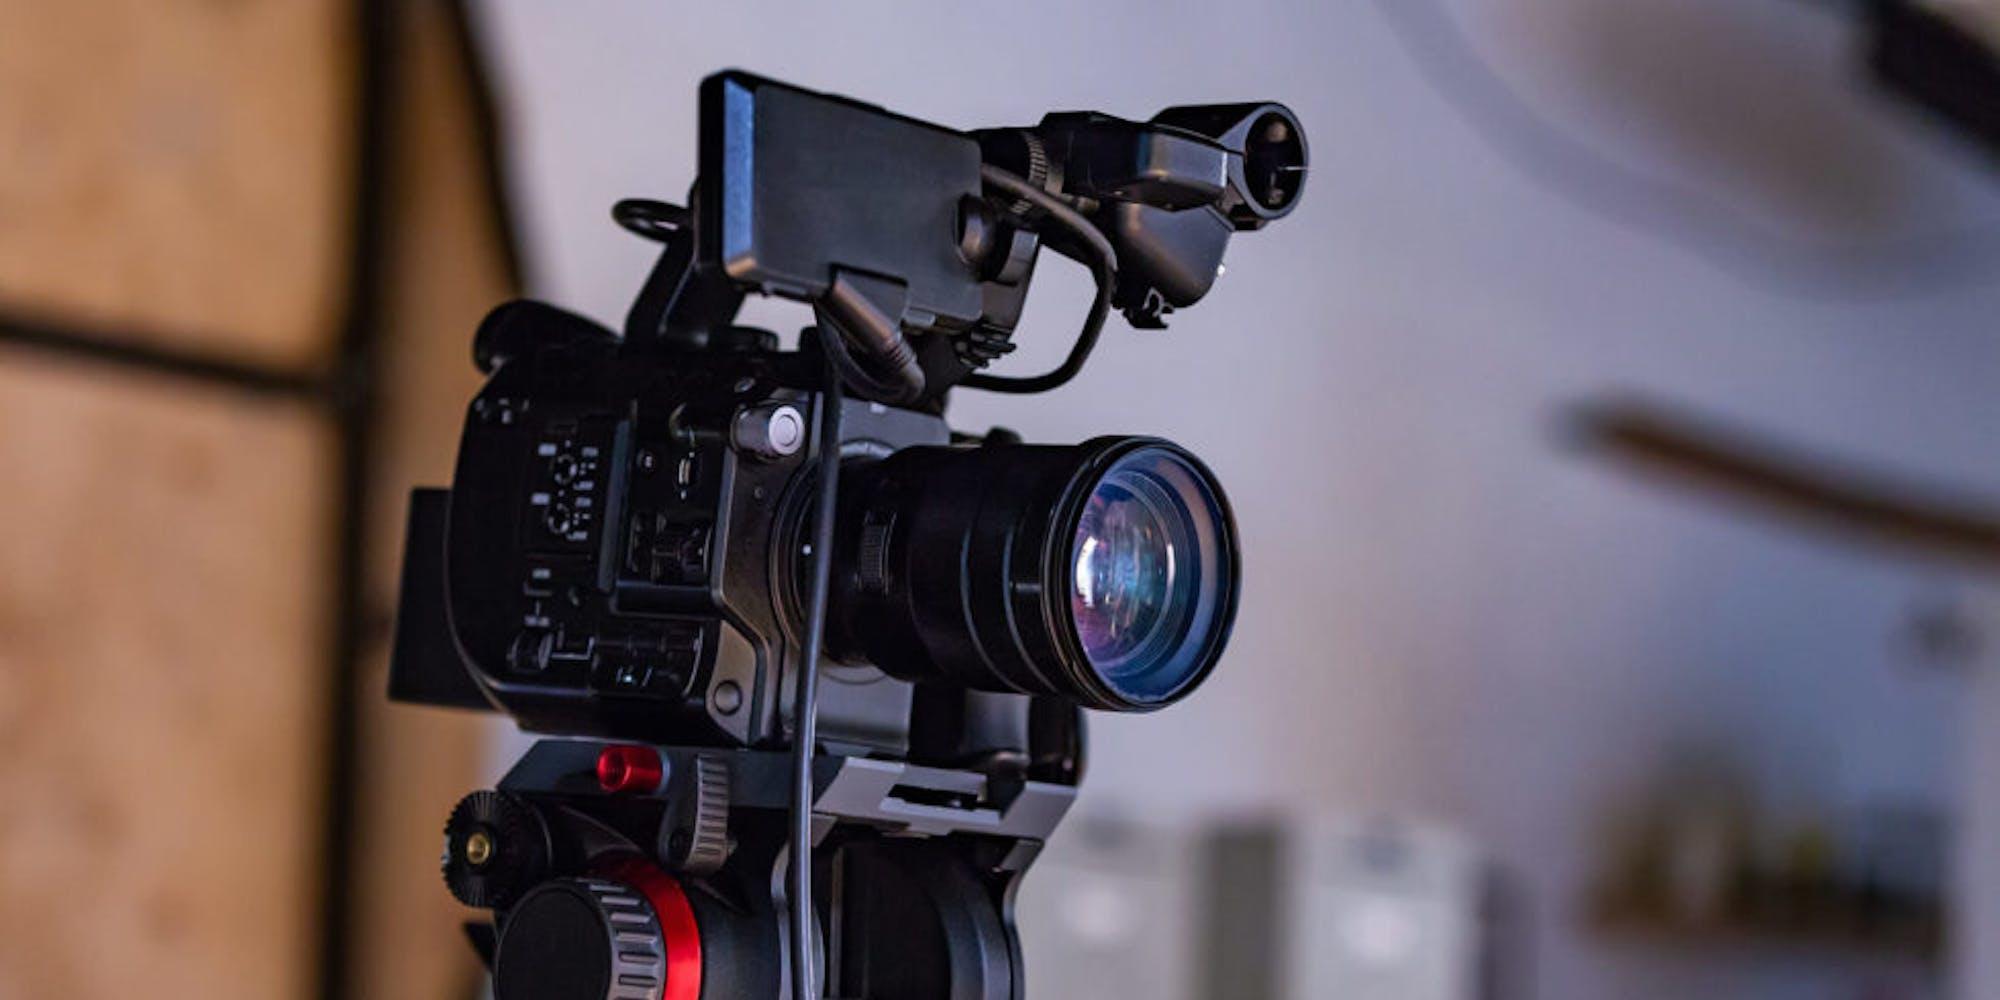 A photo of a camera